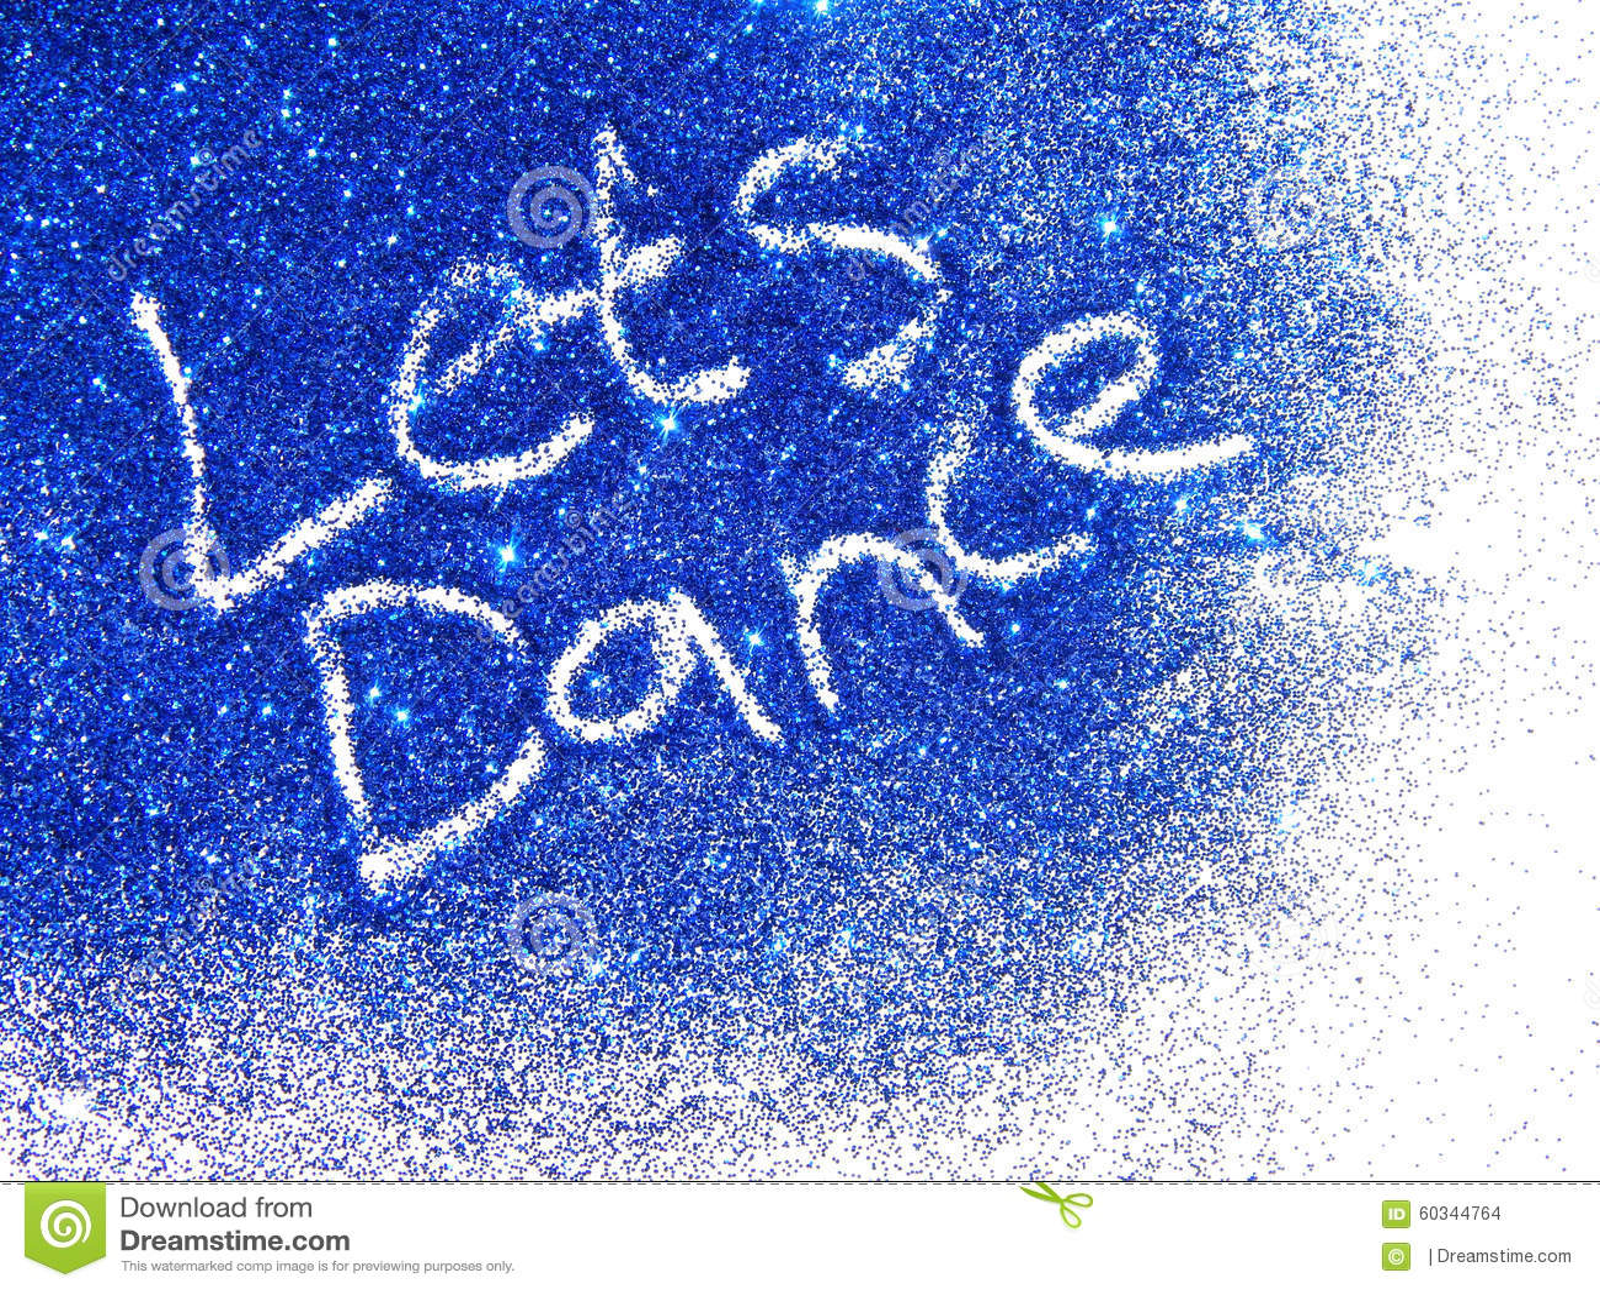 dark blue glitter sparkle with words let s dance on white background